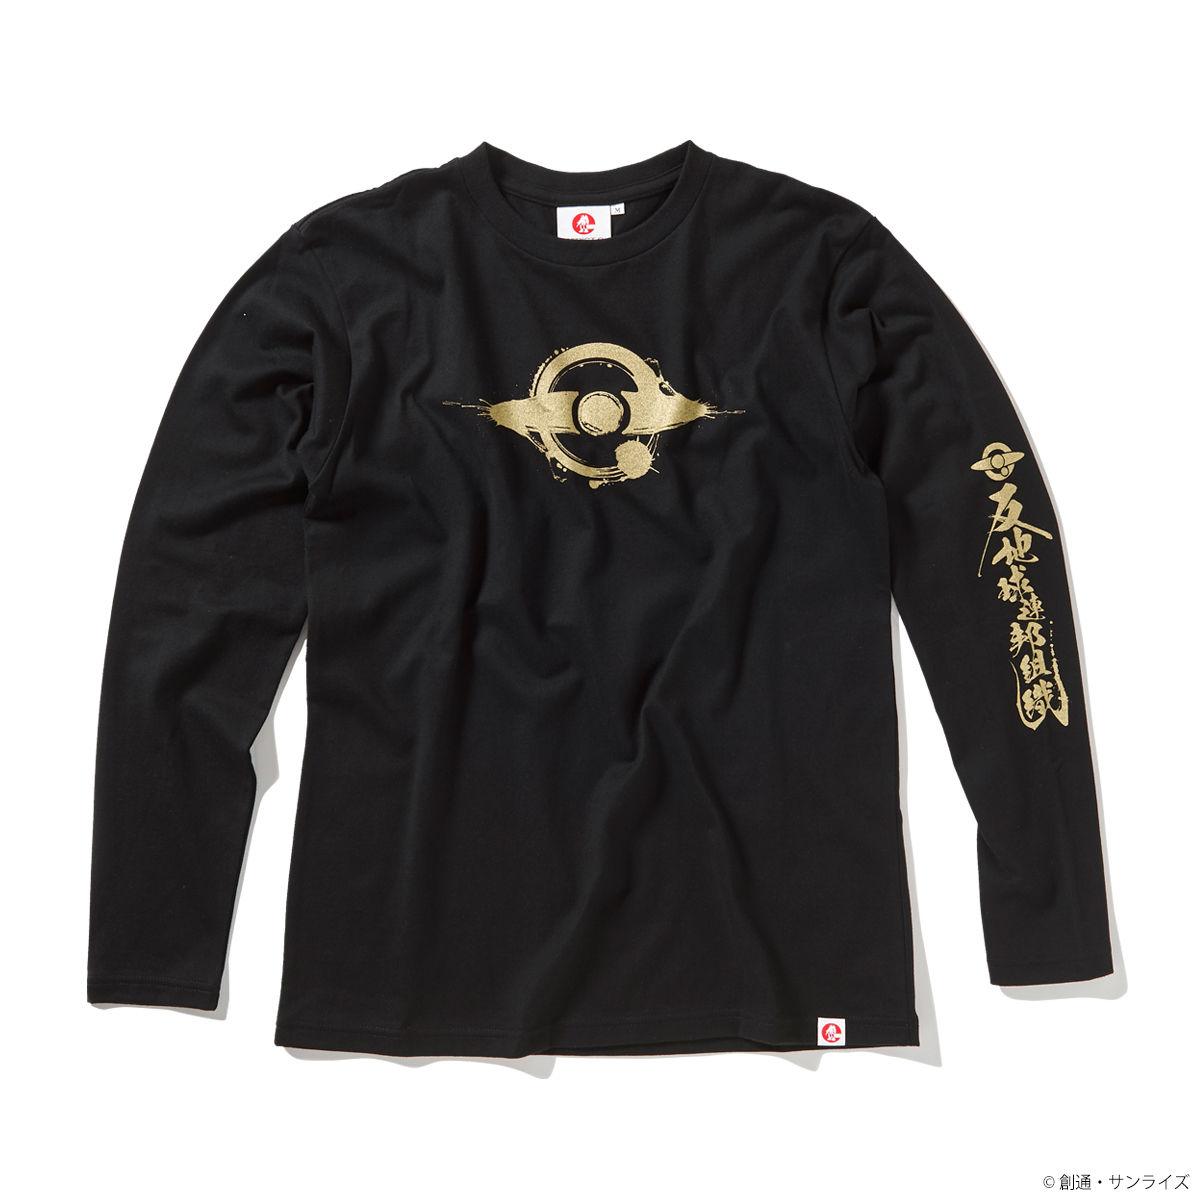 Hyaku Shiki Long-Sleeve T-shirt—Mobile Suit Gundam/STRICT-G JAPAN Collaboration